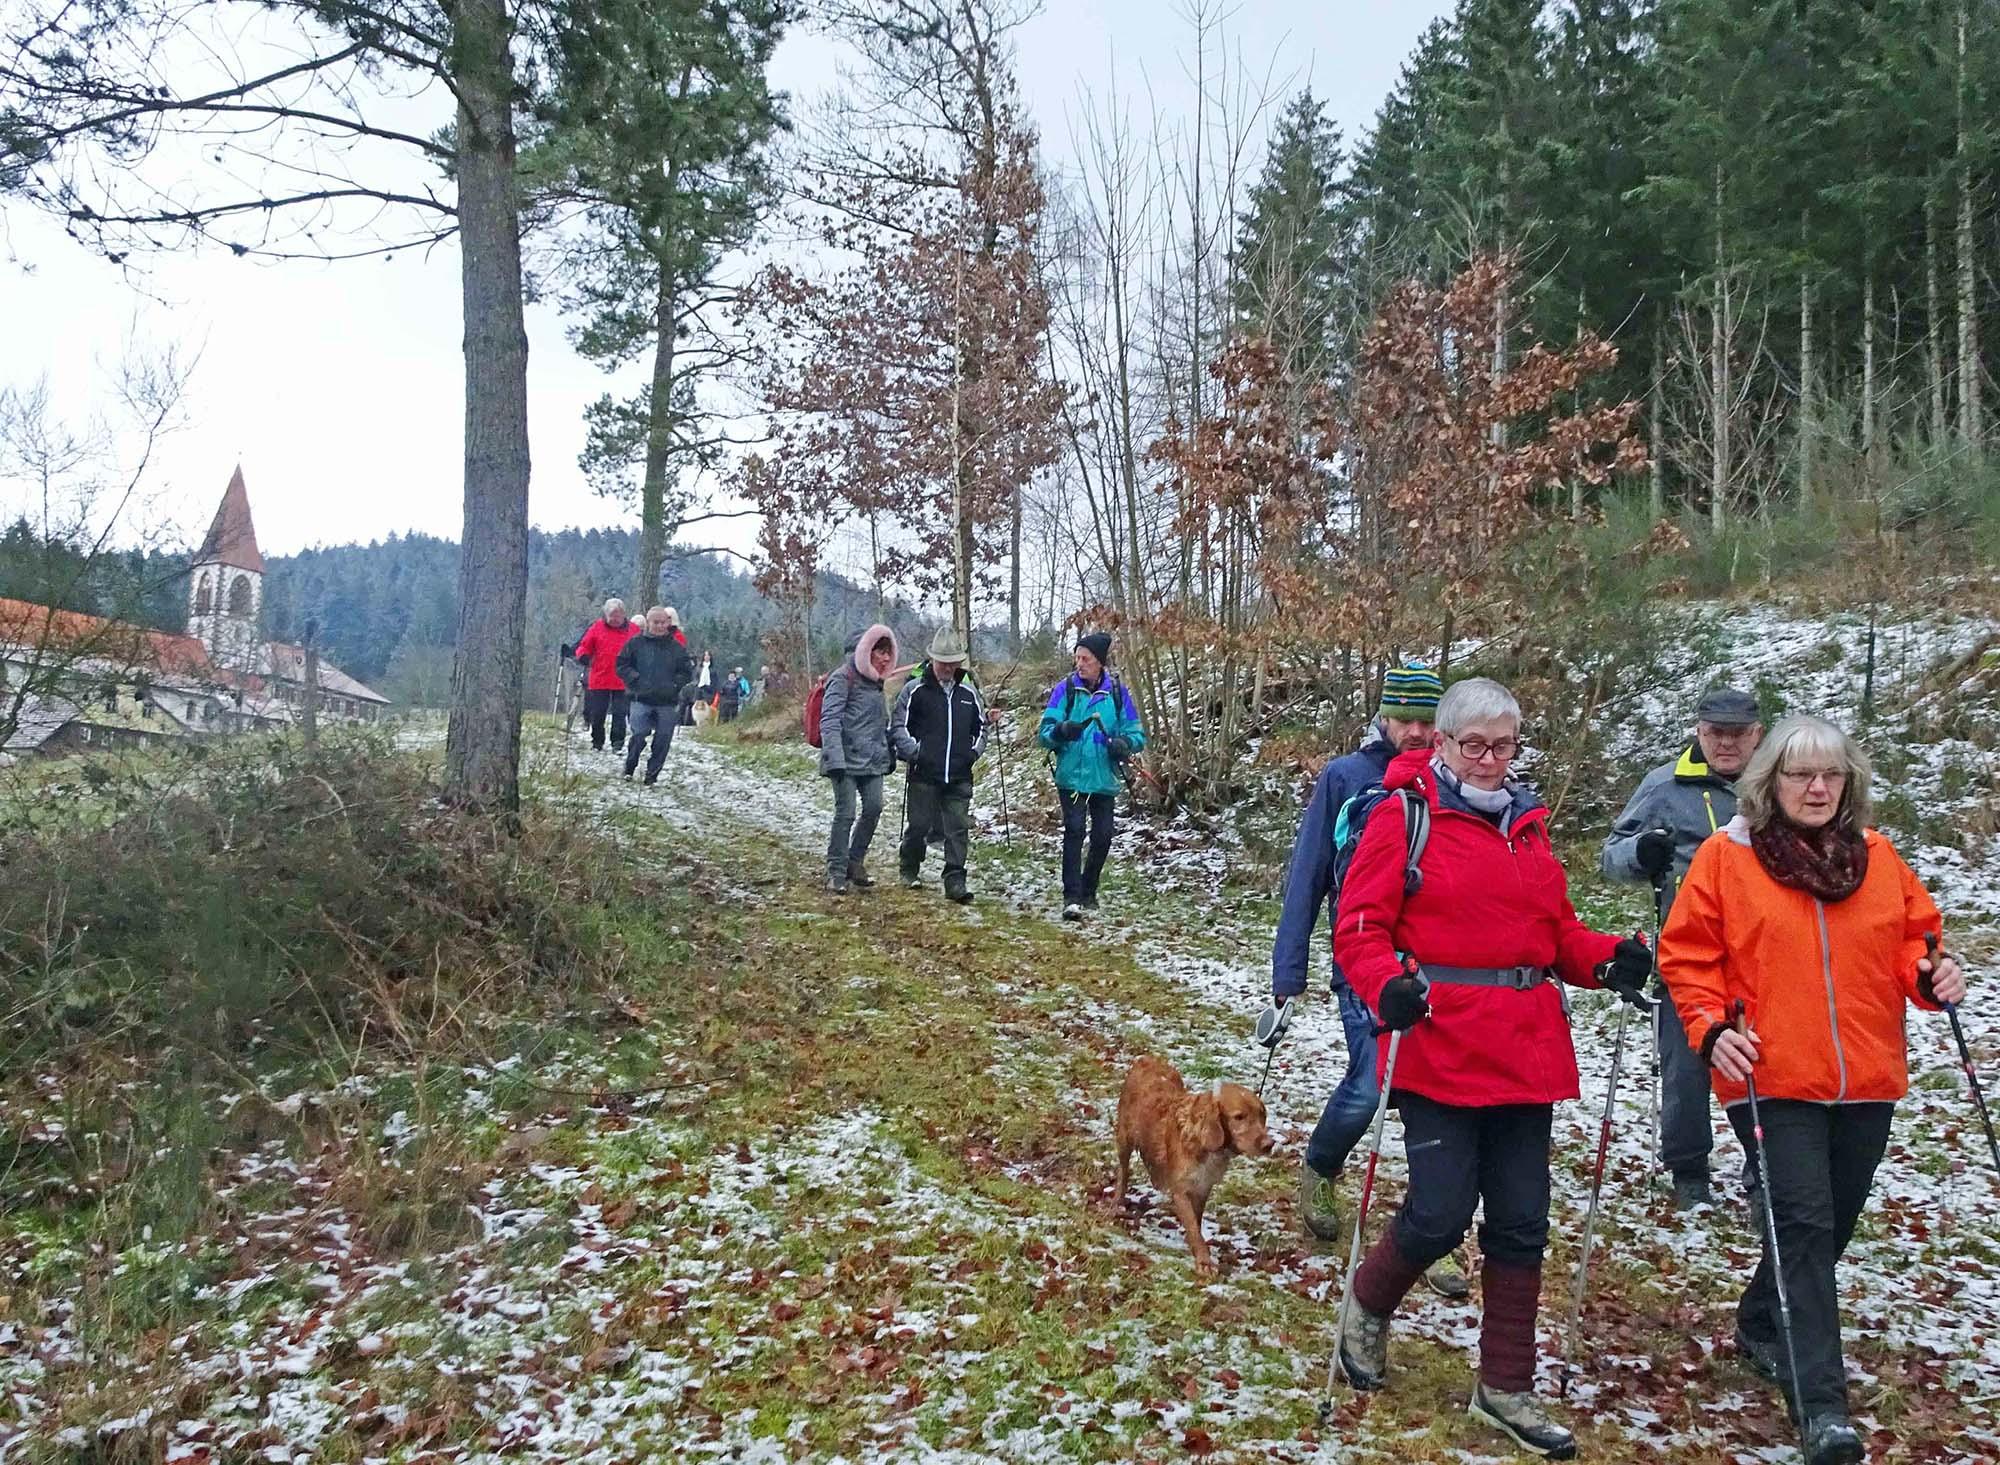 2020-1-31-St Roman-SWV Bezirk Wandern DSC04450 Wandern Bezirk Sankt Roman Ingeborg Bruder